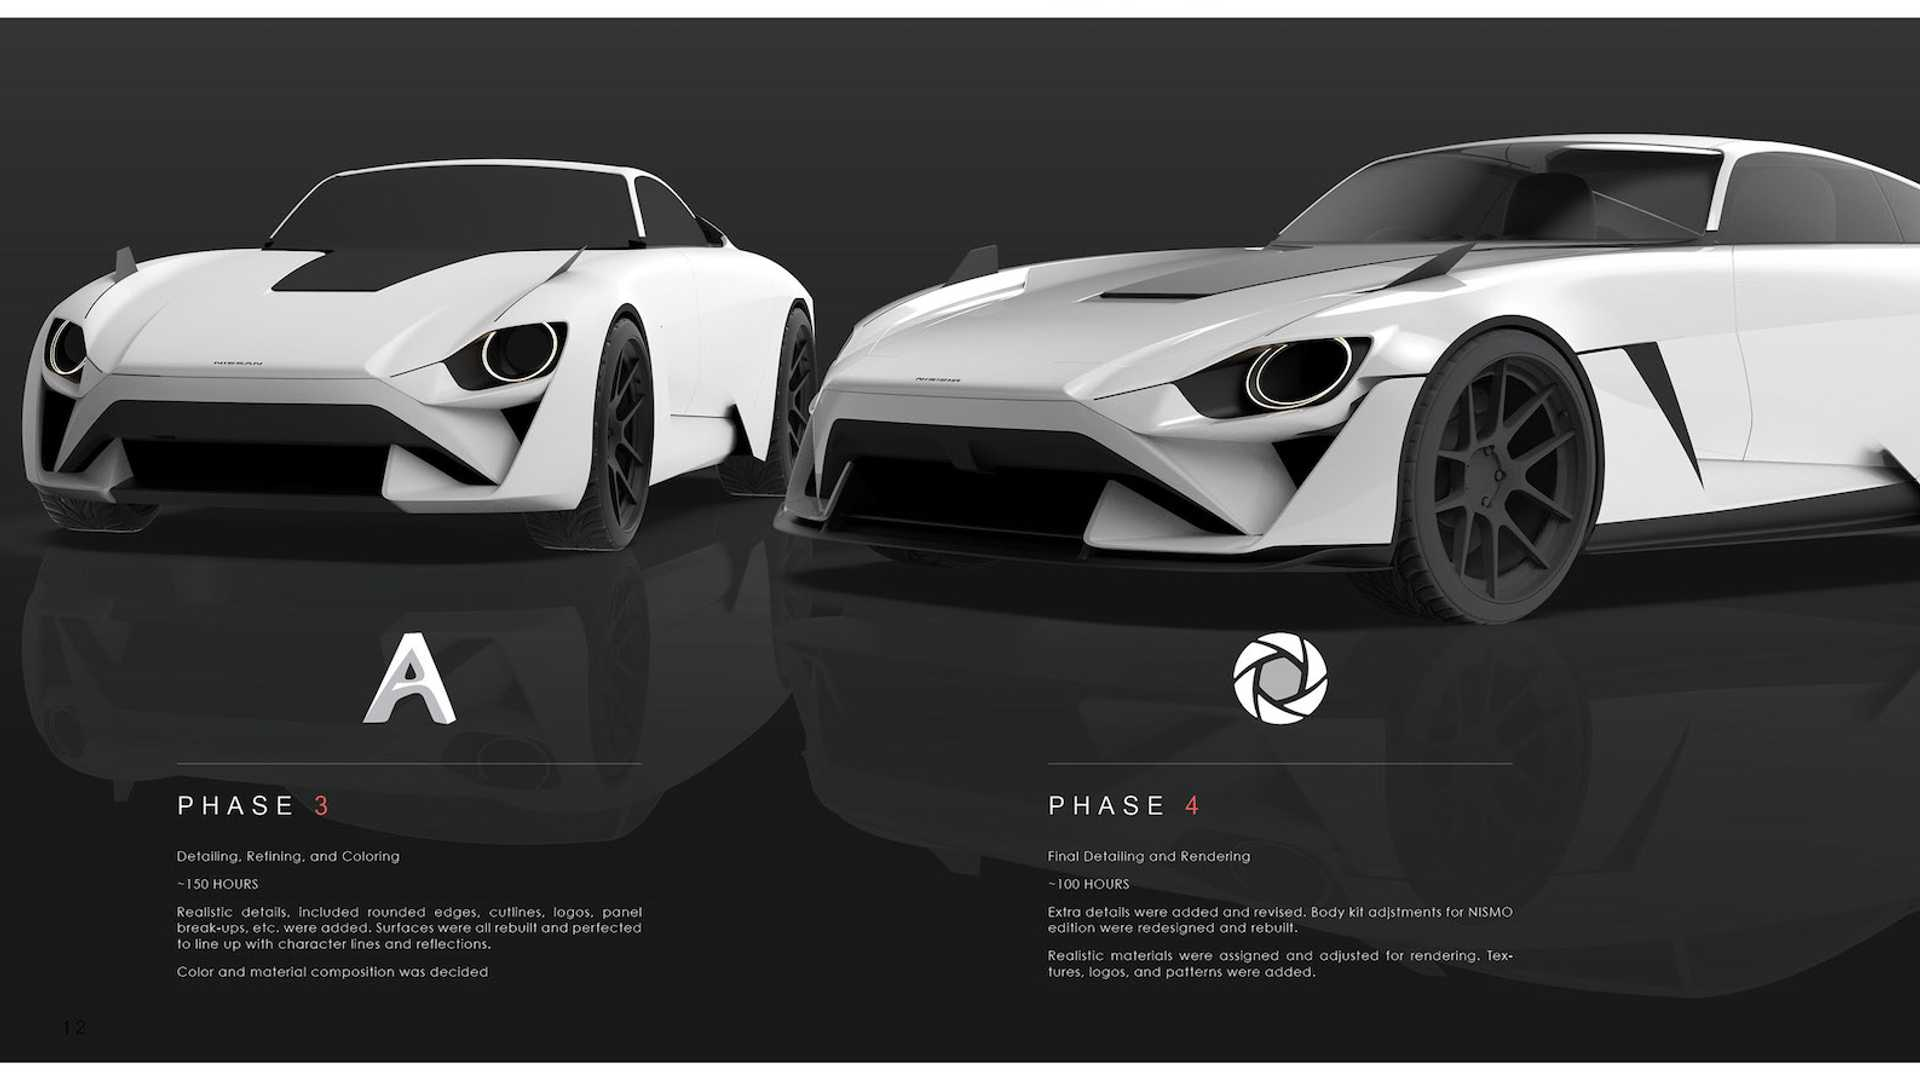 Designer Renders Next Nissan Z Car With Fantastic Retro Cues